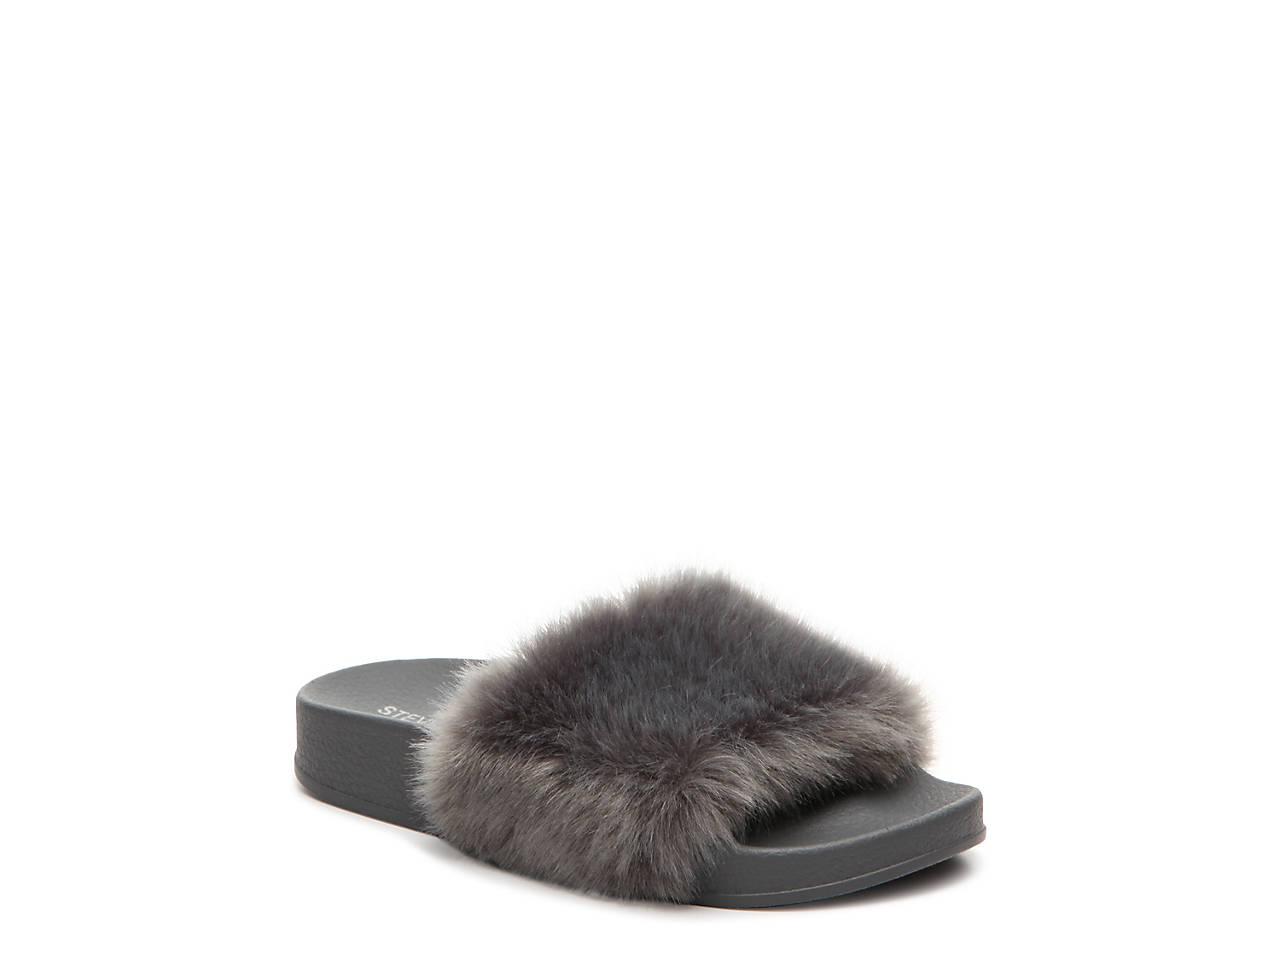 da7592dda Steve Madden Softey Youth Slide Sandal Kids Shoes | DSW